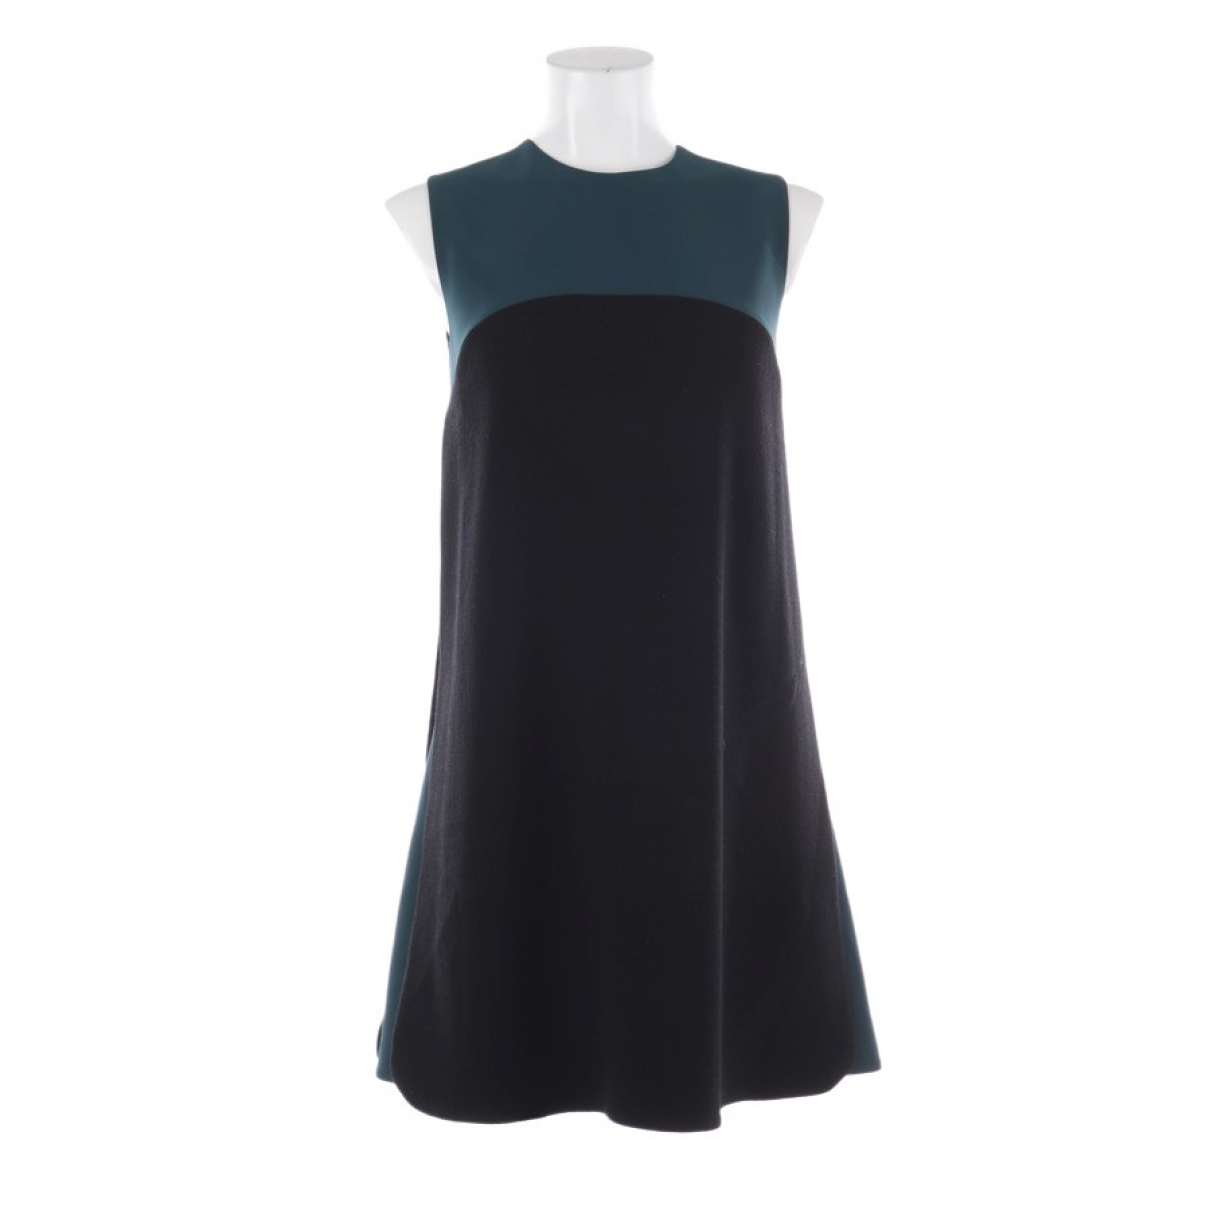 Victoria Beckham \N Kleid in  Blau Synthetik